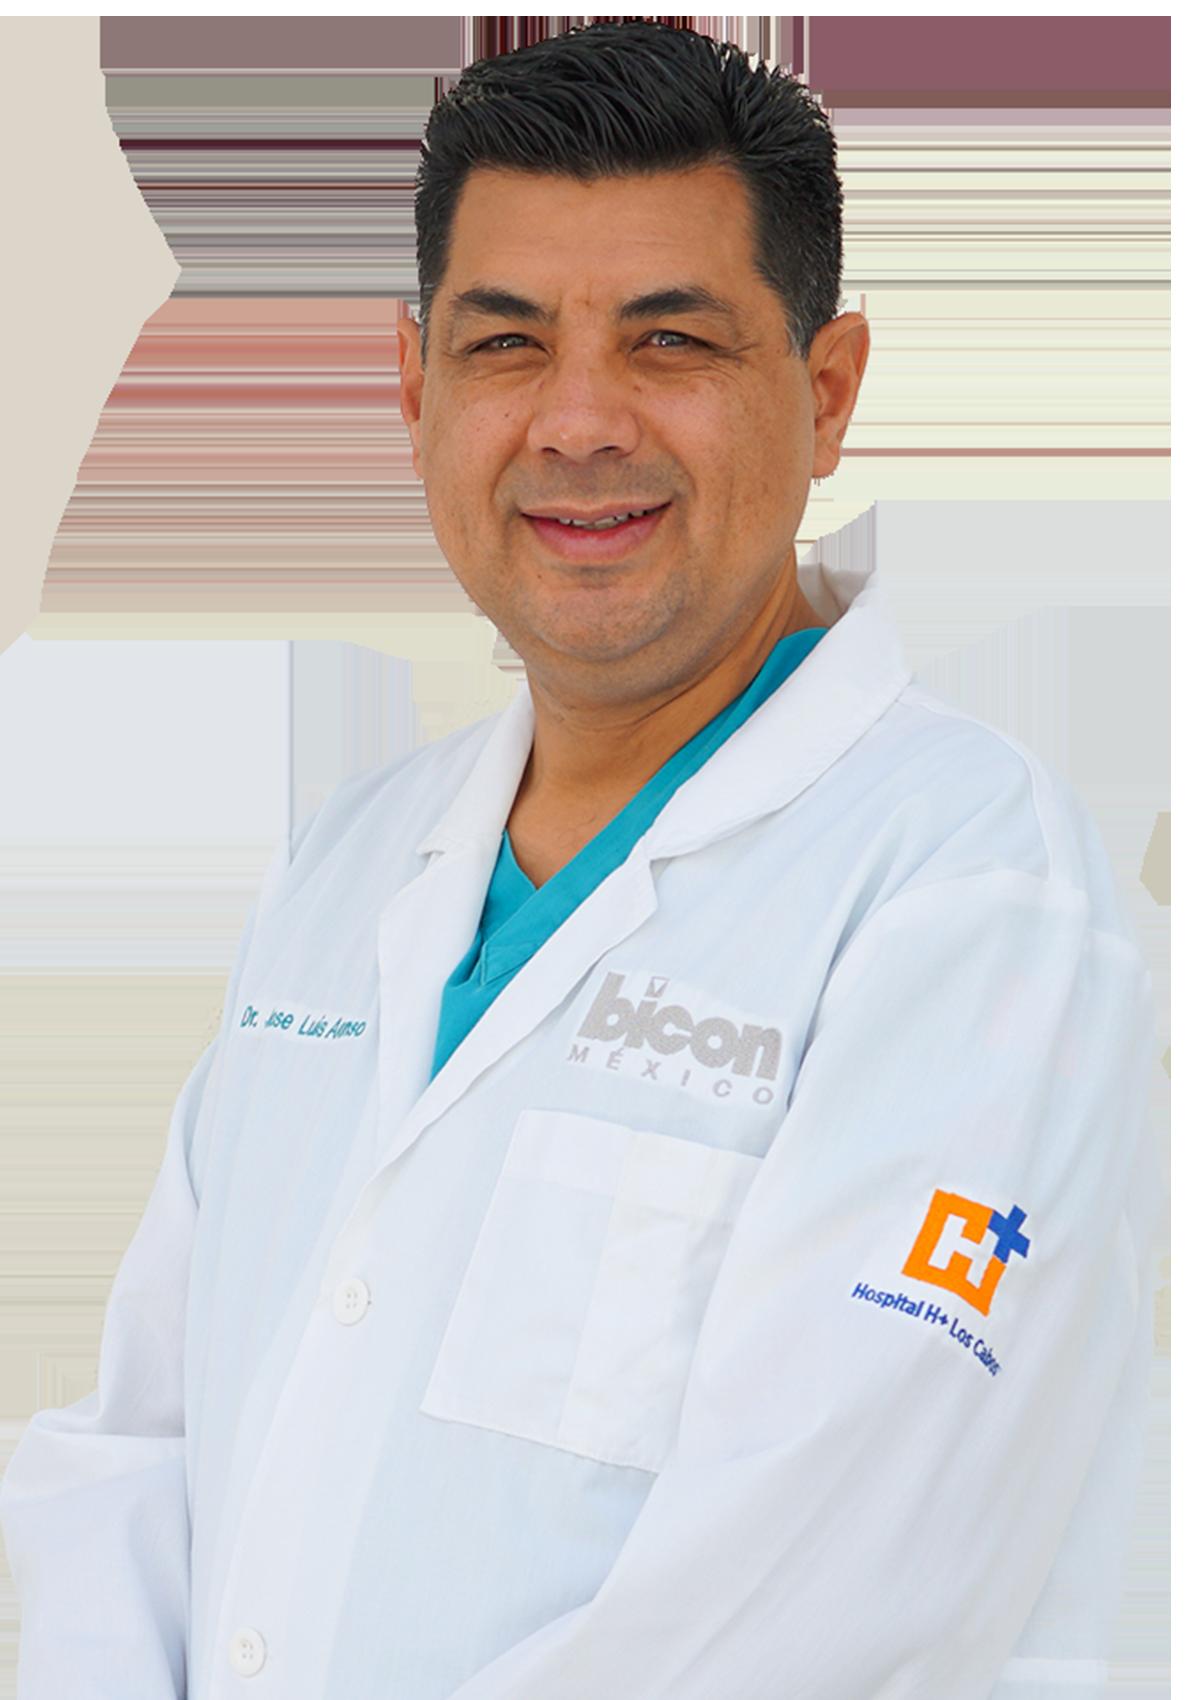 https://biconmexico.com/wp-content/uploads/2021/04/doc-con-bata.png